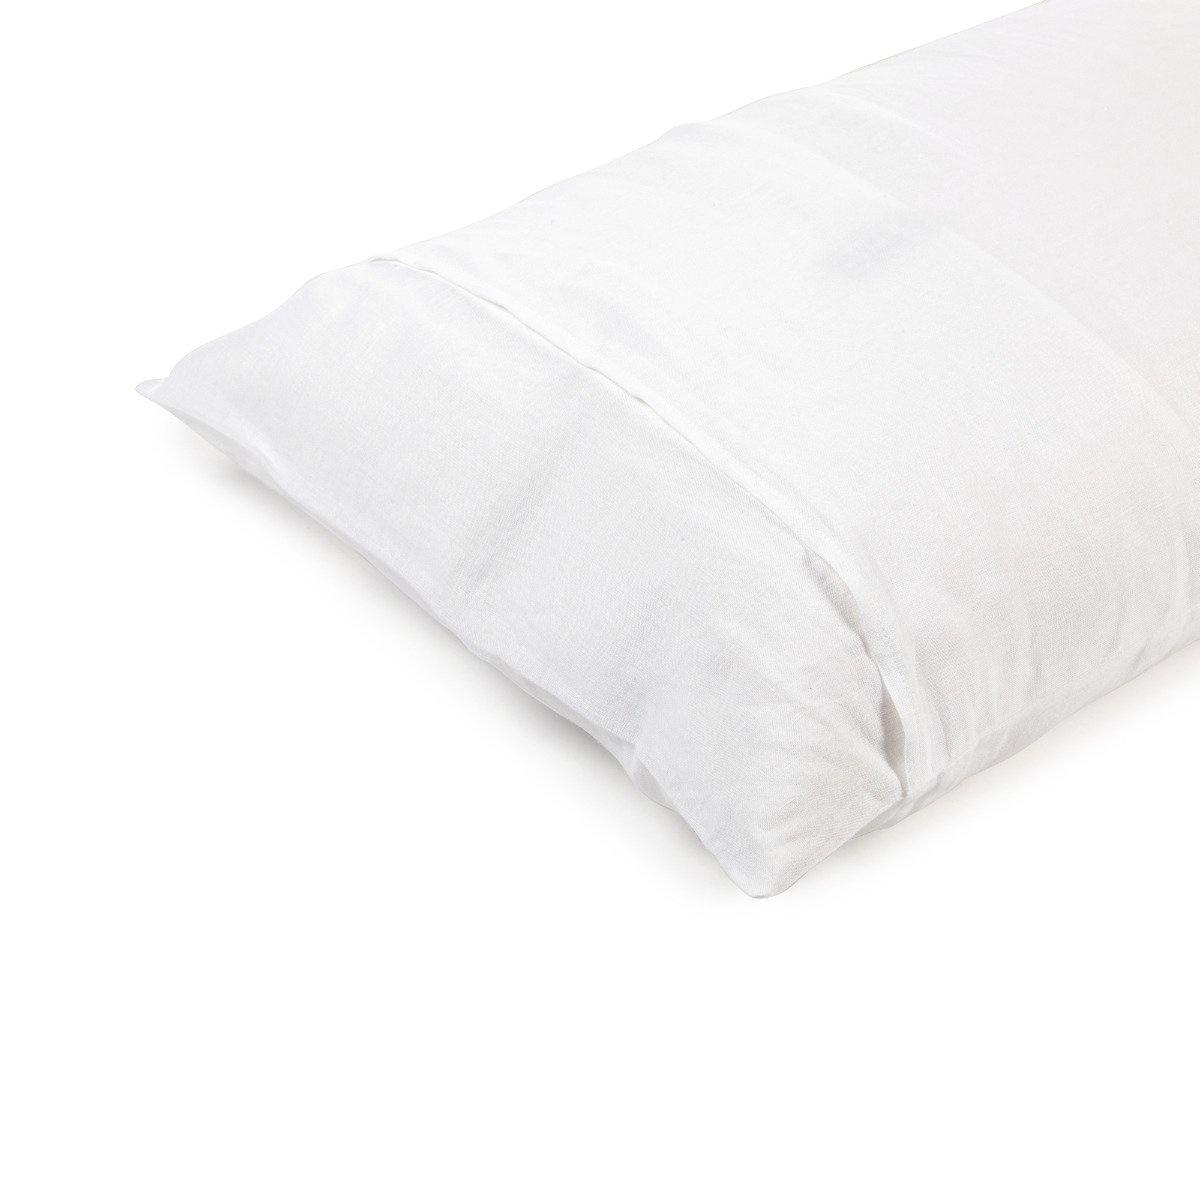 Pillowcase - Santiago - Asst Colours-2